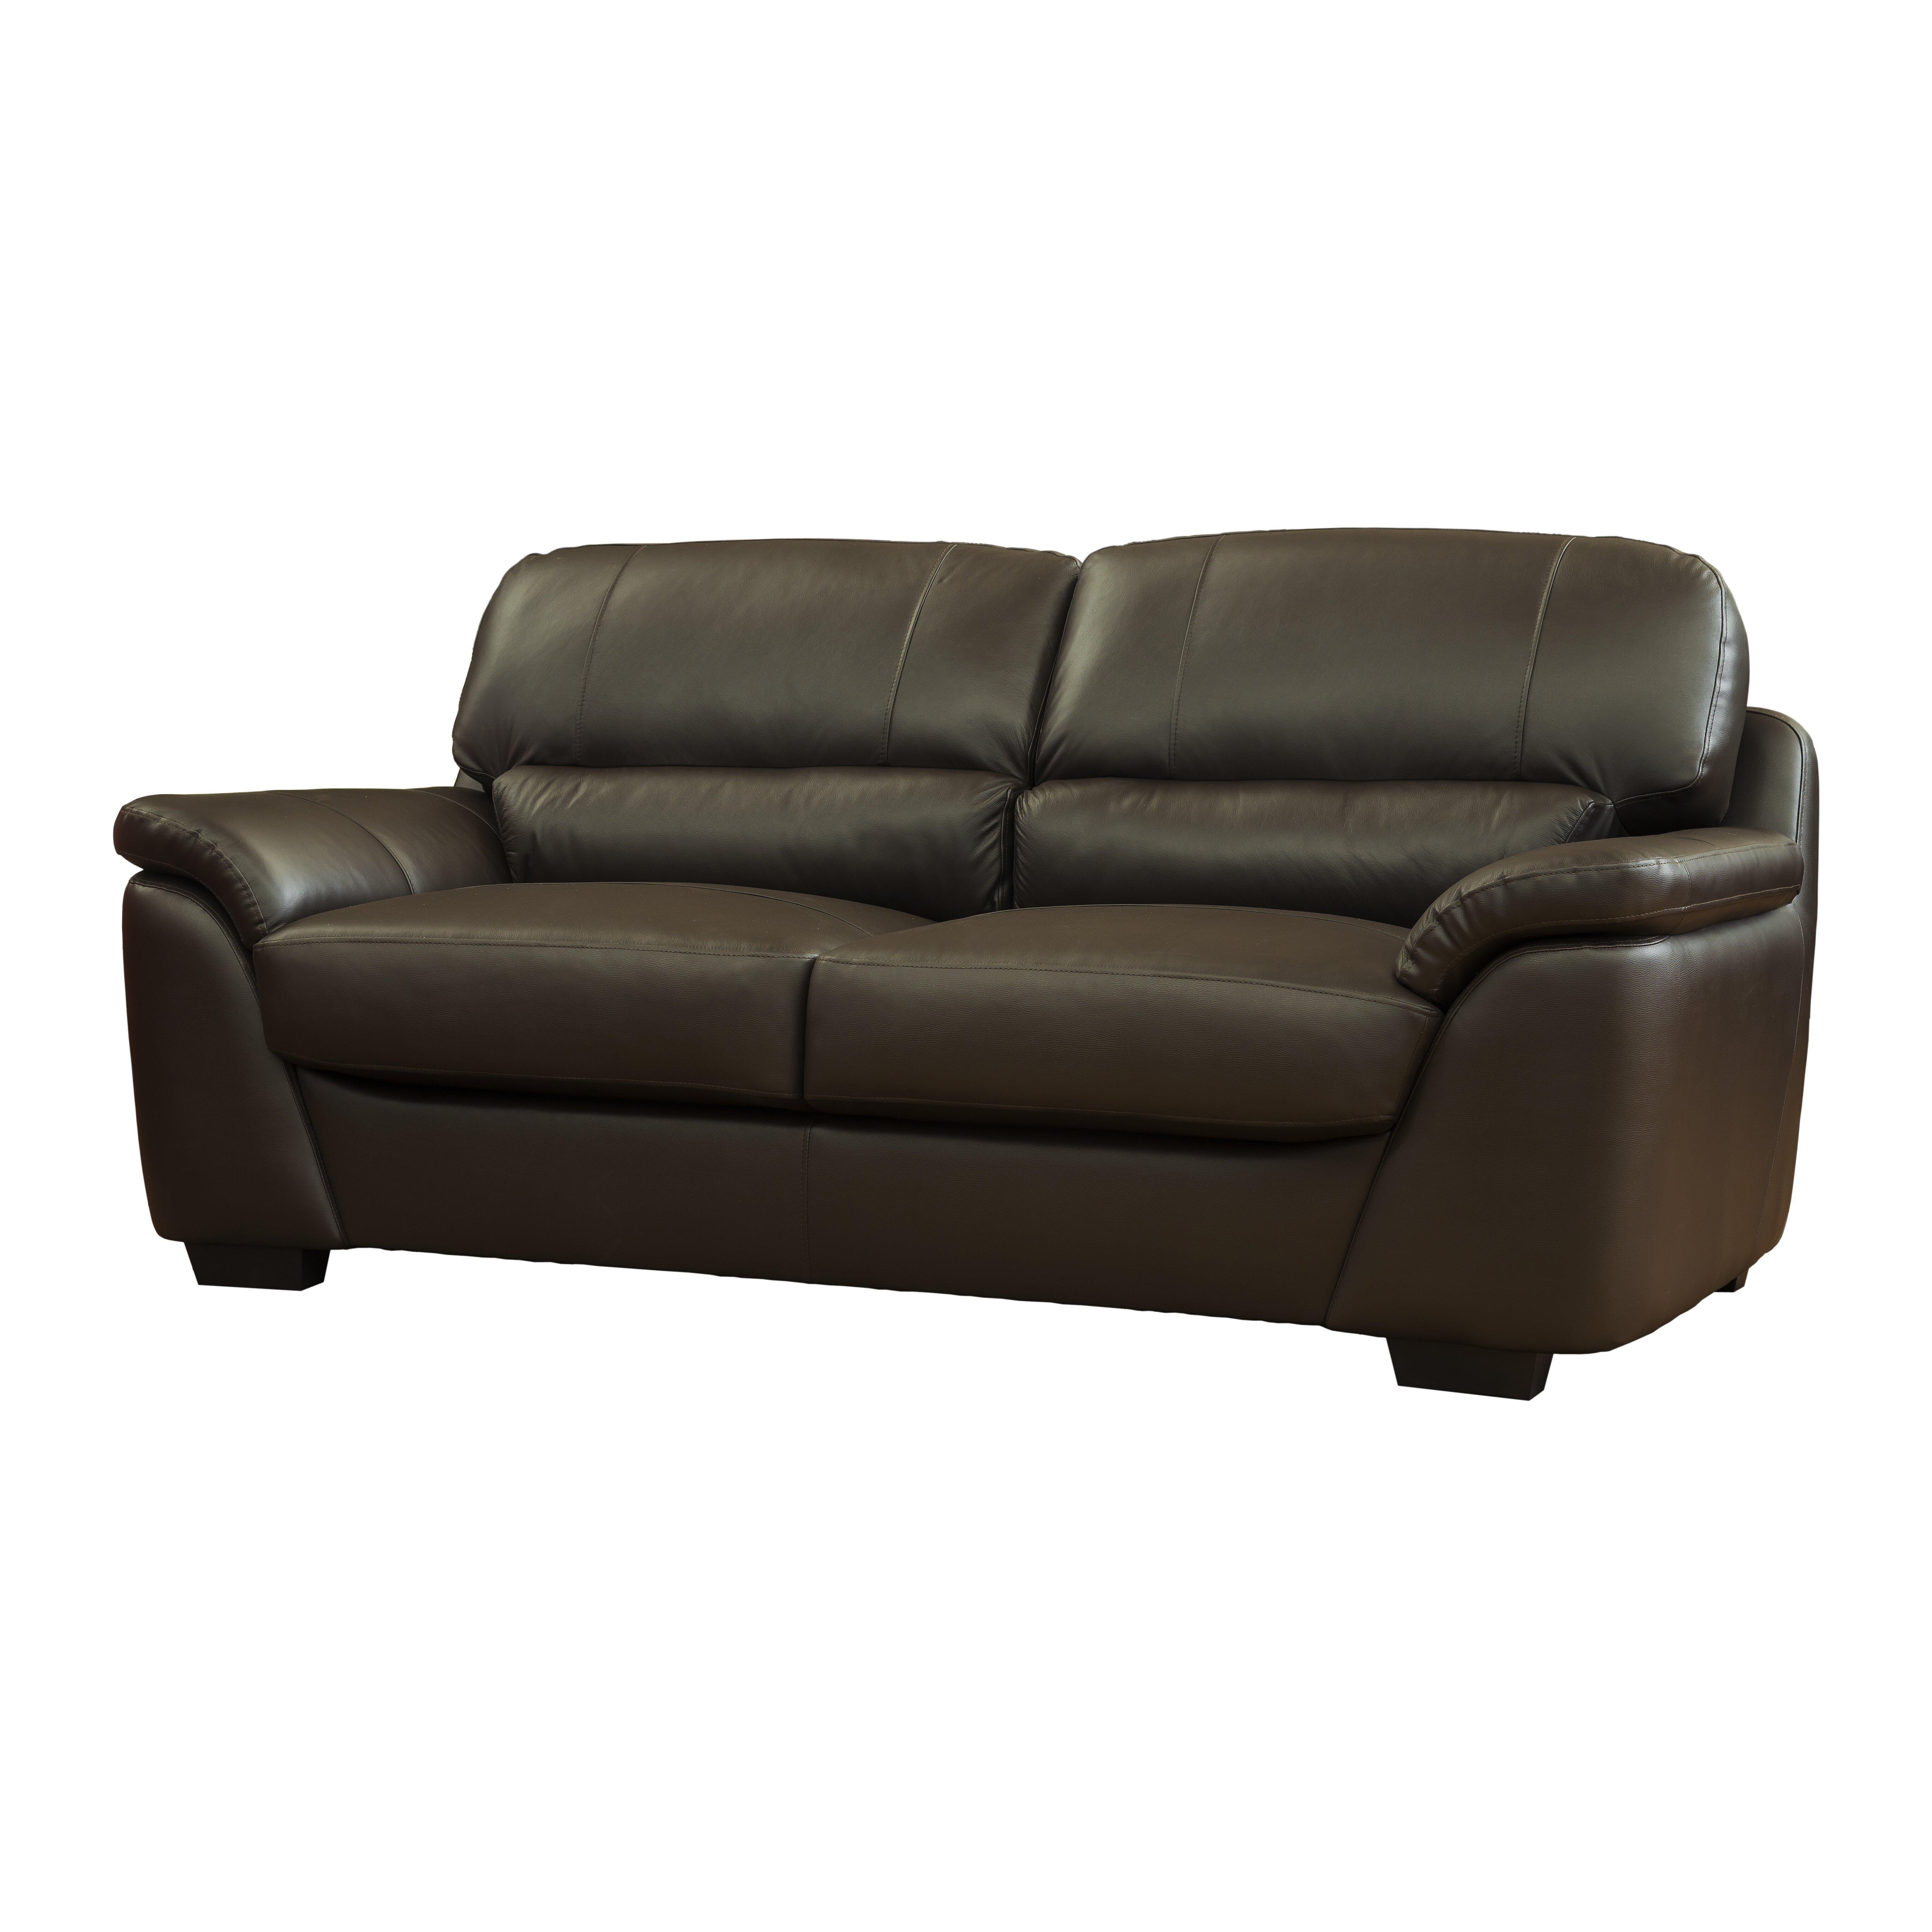 Seattle 2 3 Seater Sofa Set